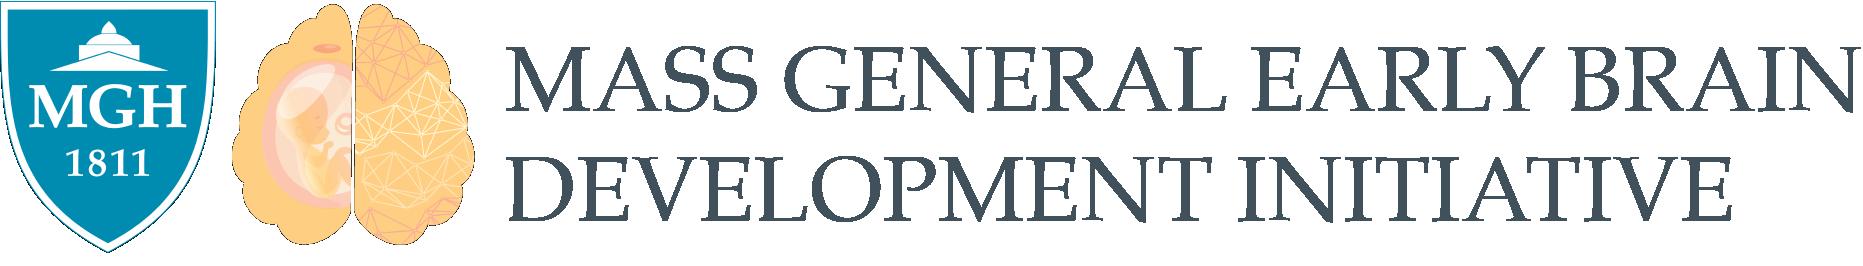 MGH Early Brain Development Initiative